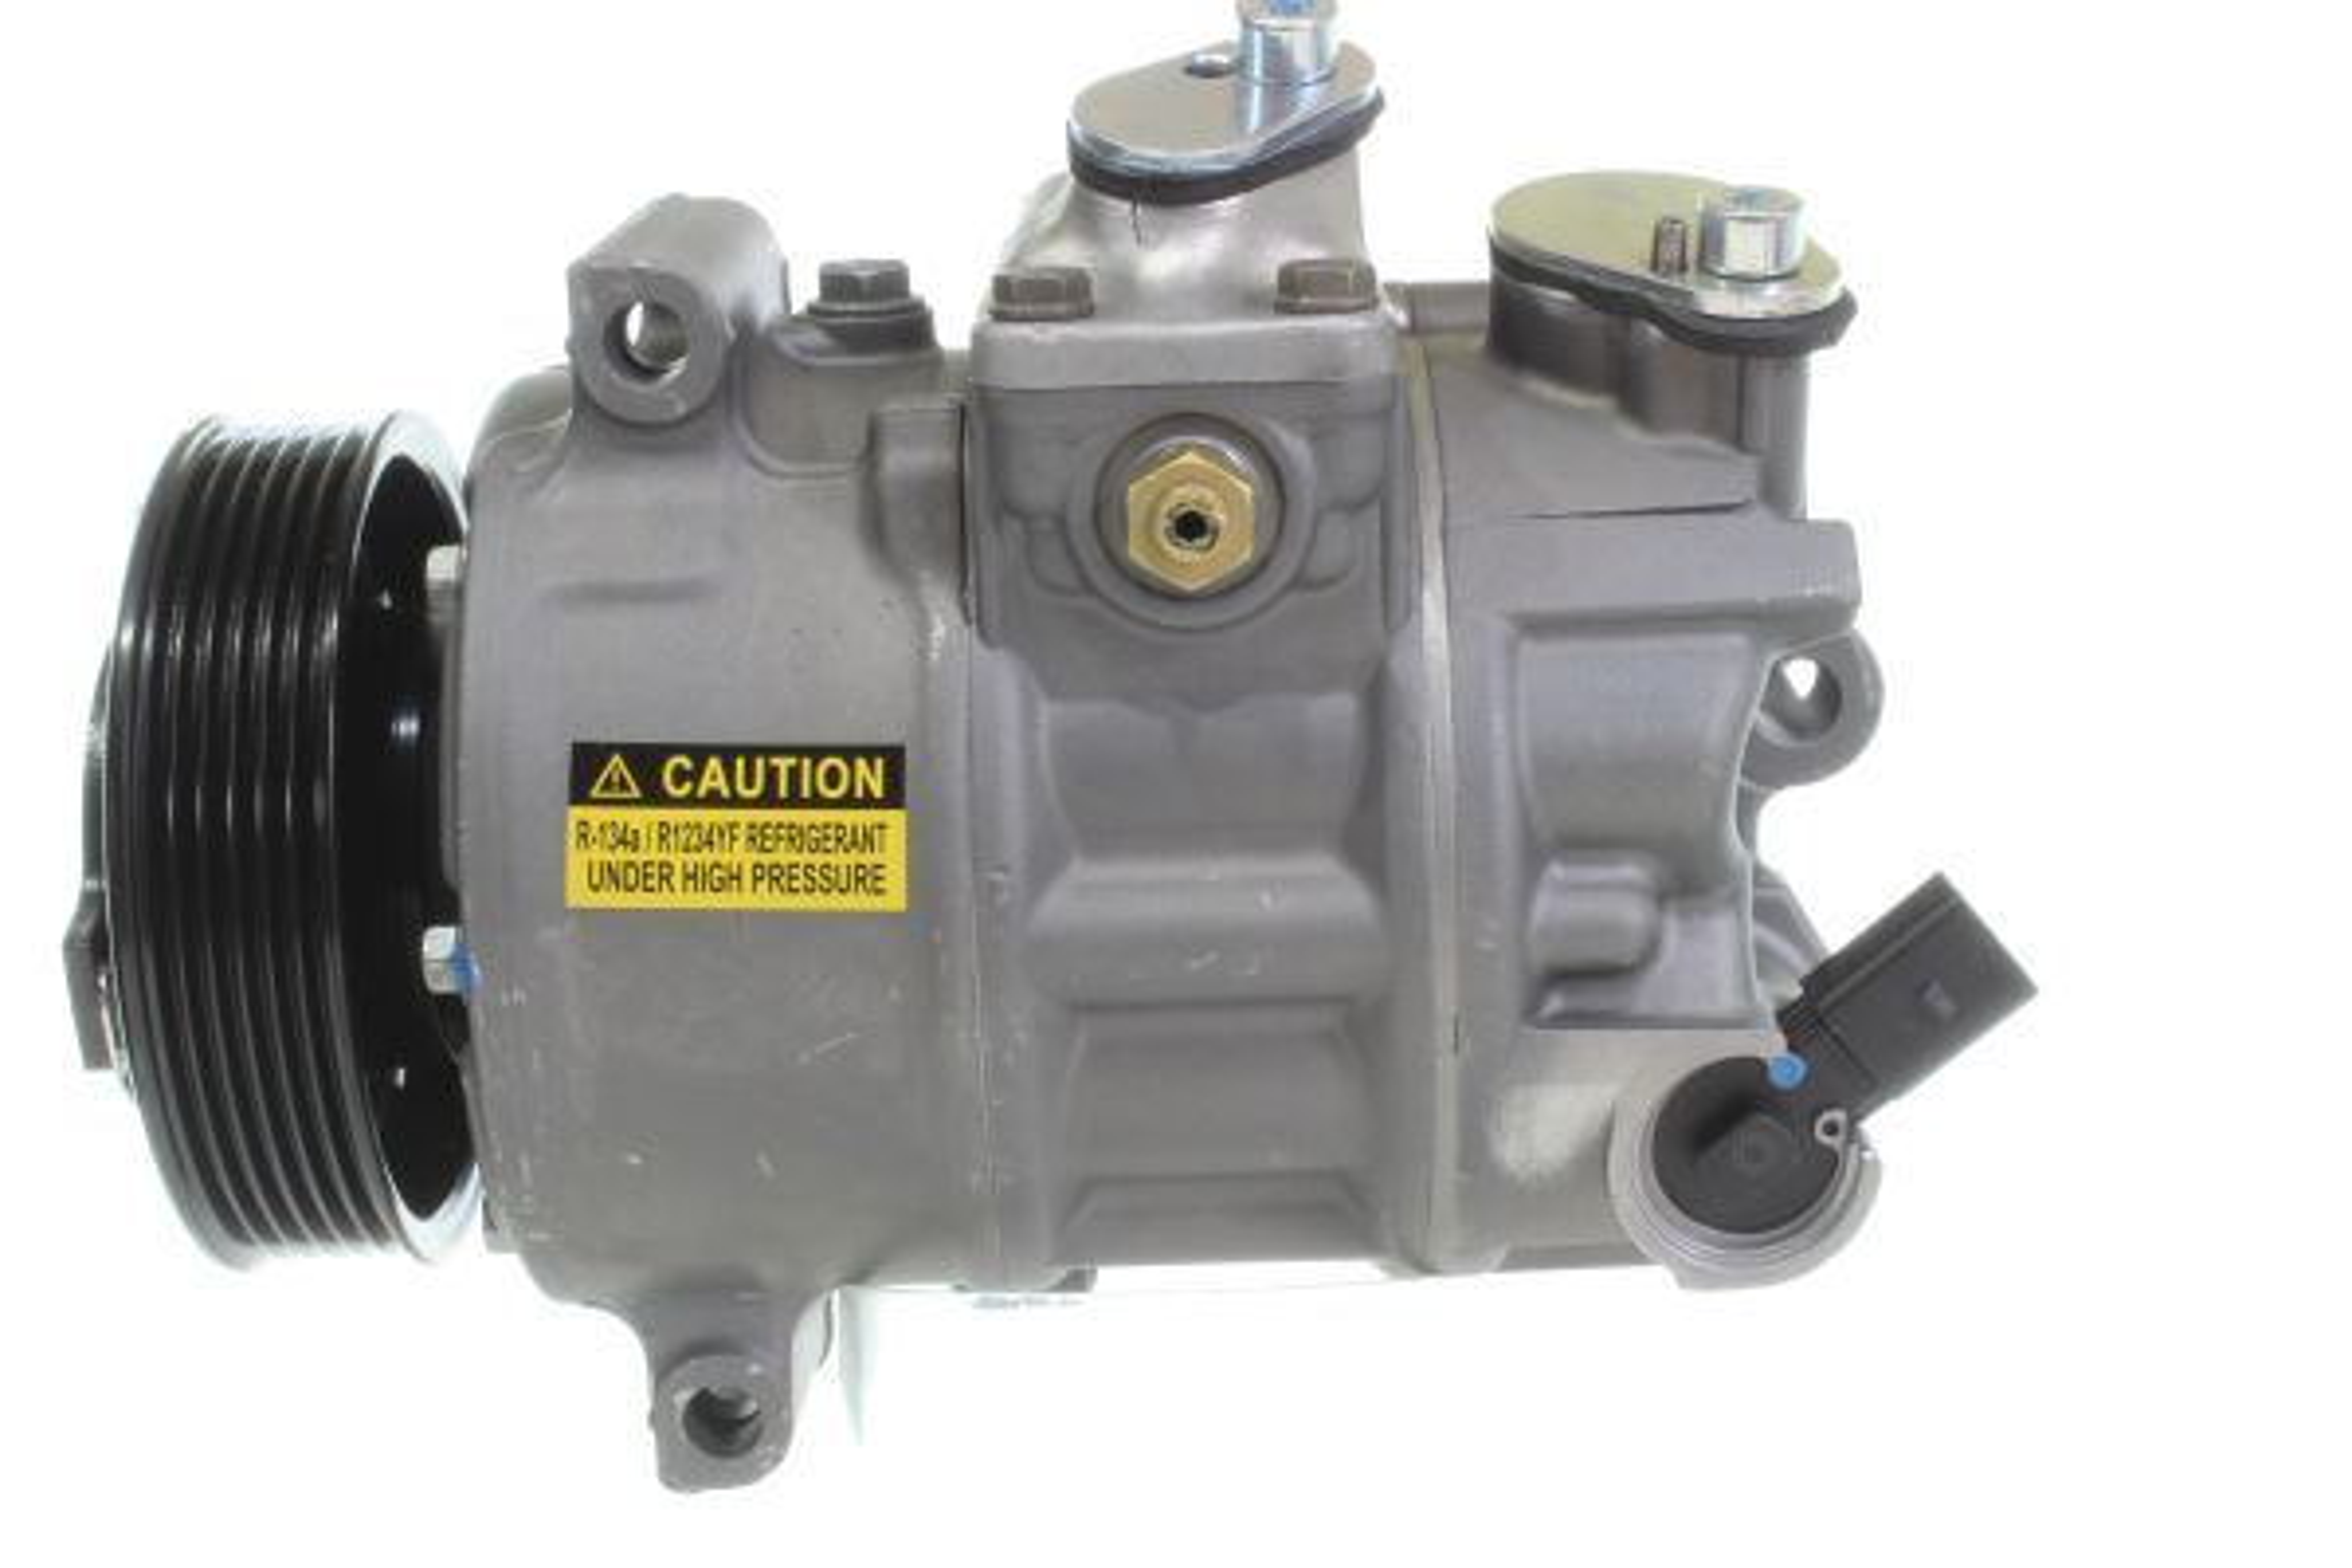 10550442 Kompressor, Klimaanlage ALANKO 550442 - Große Auswahl - stark reduziert